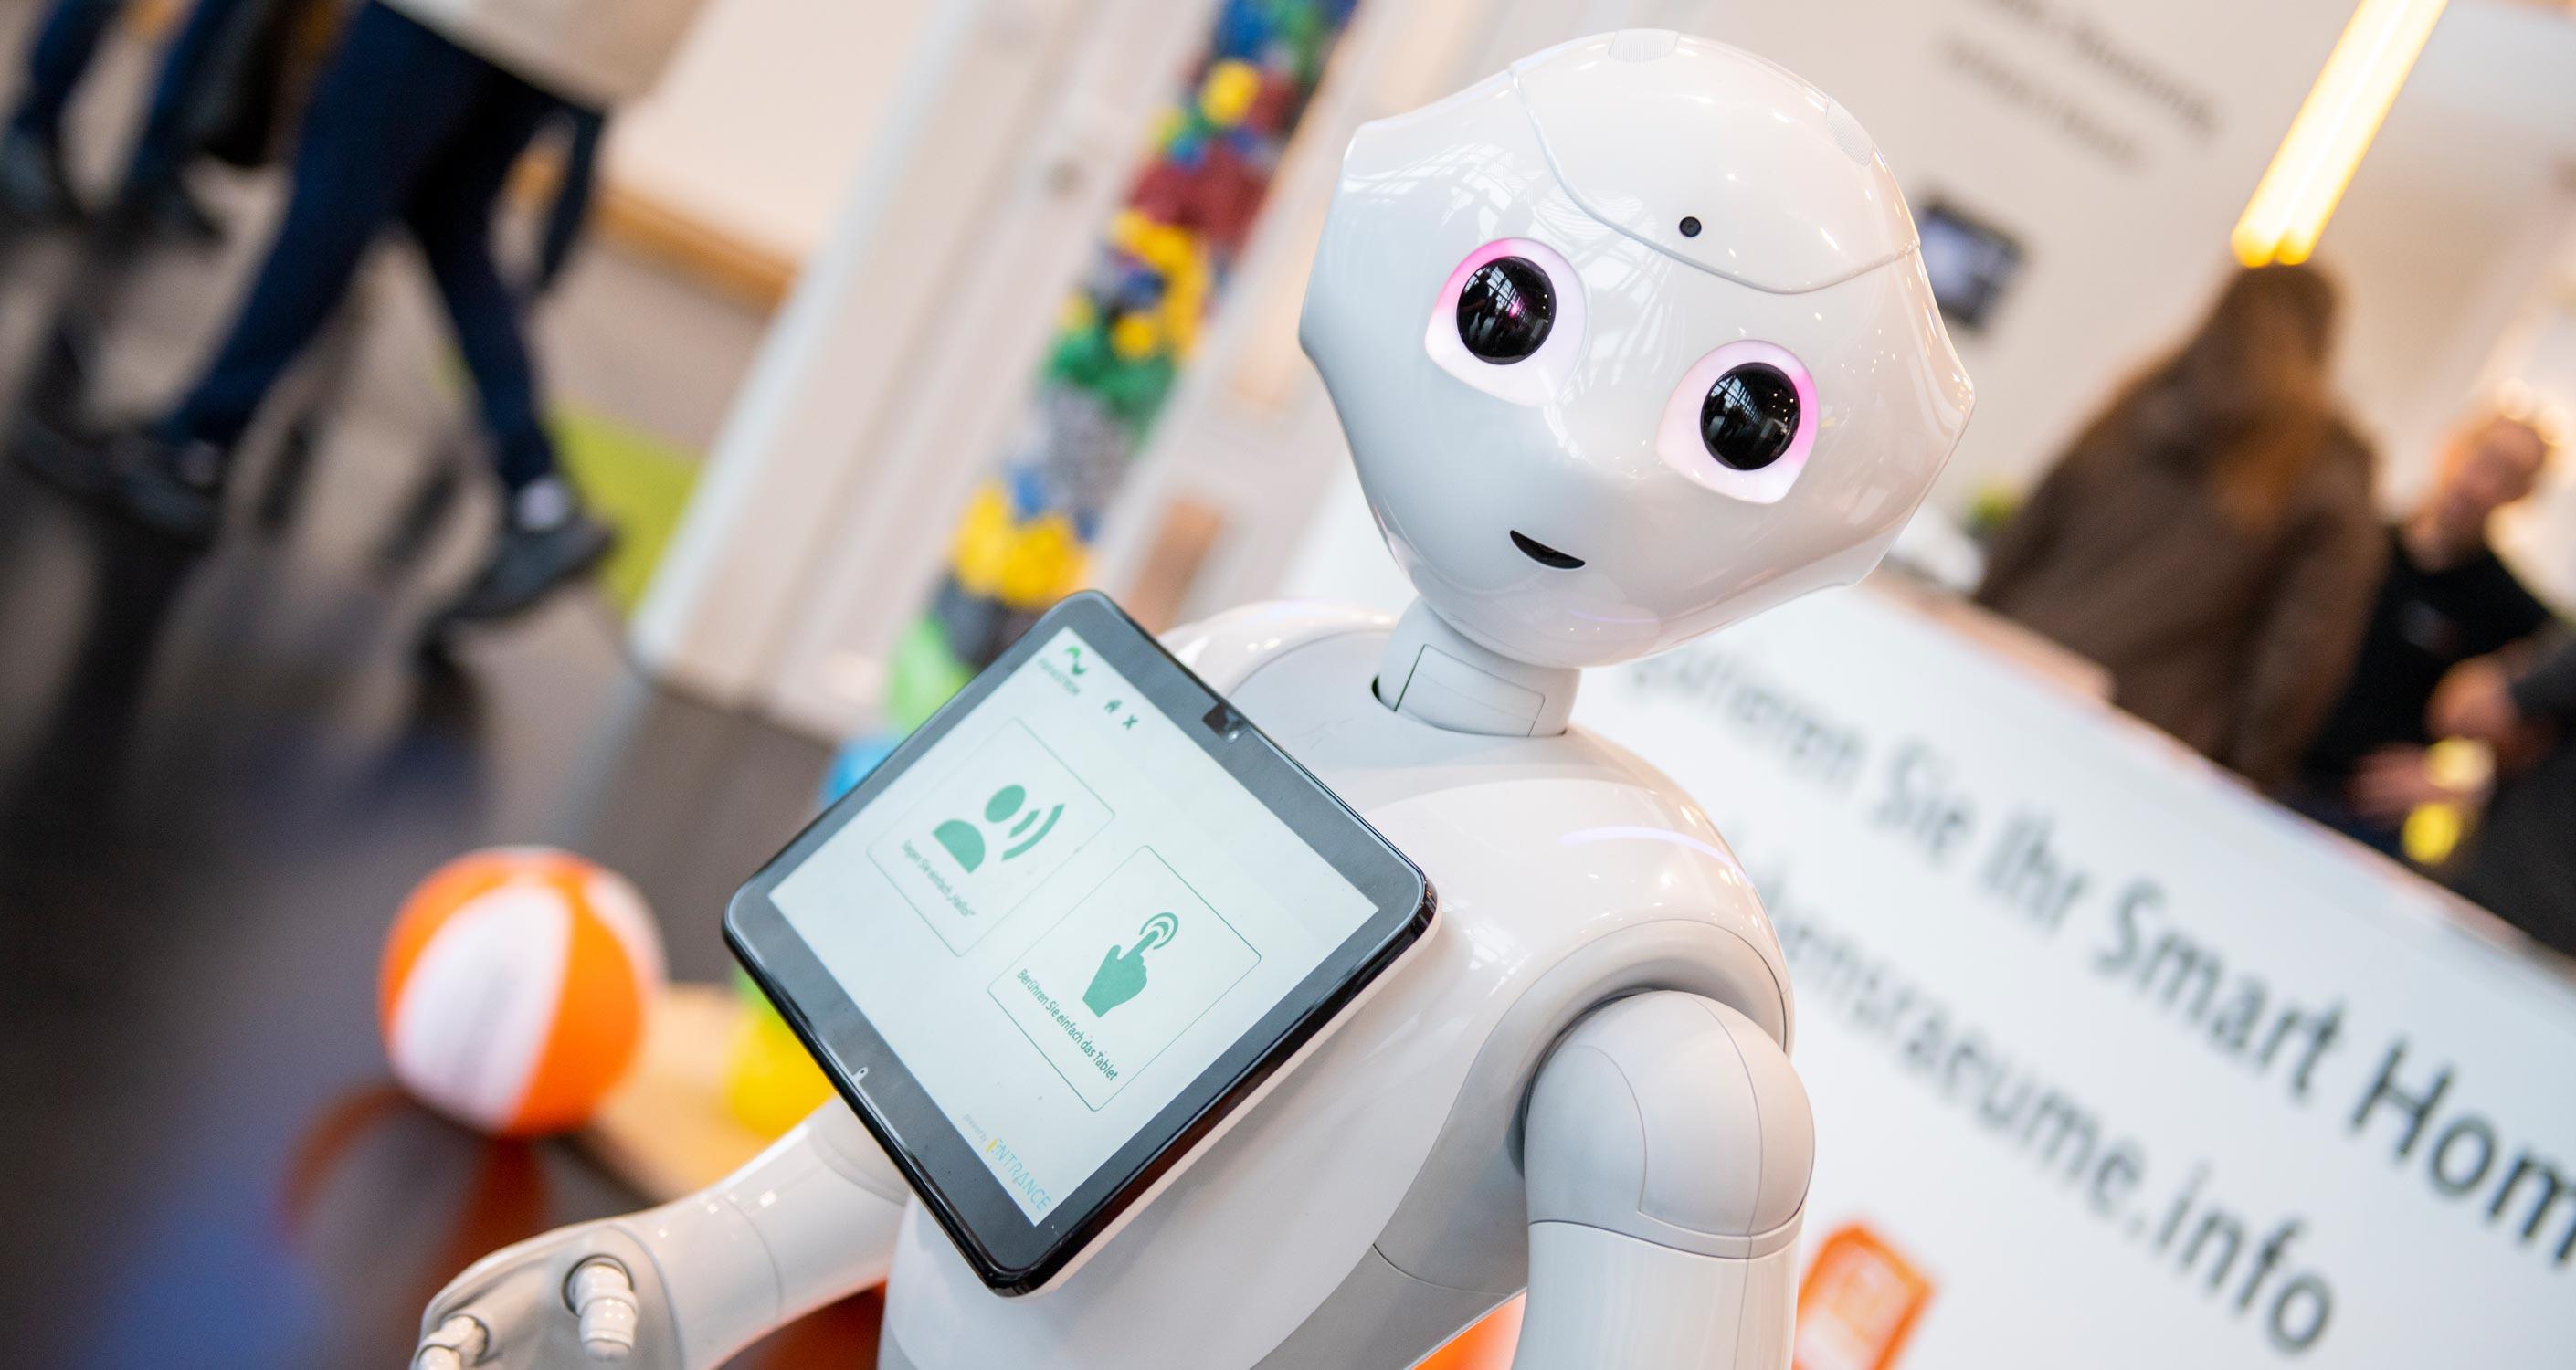 Rückblick eltec 2019 - Robot